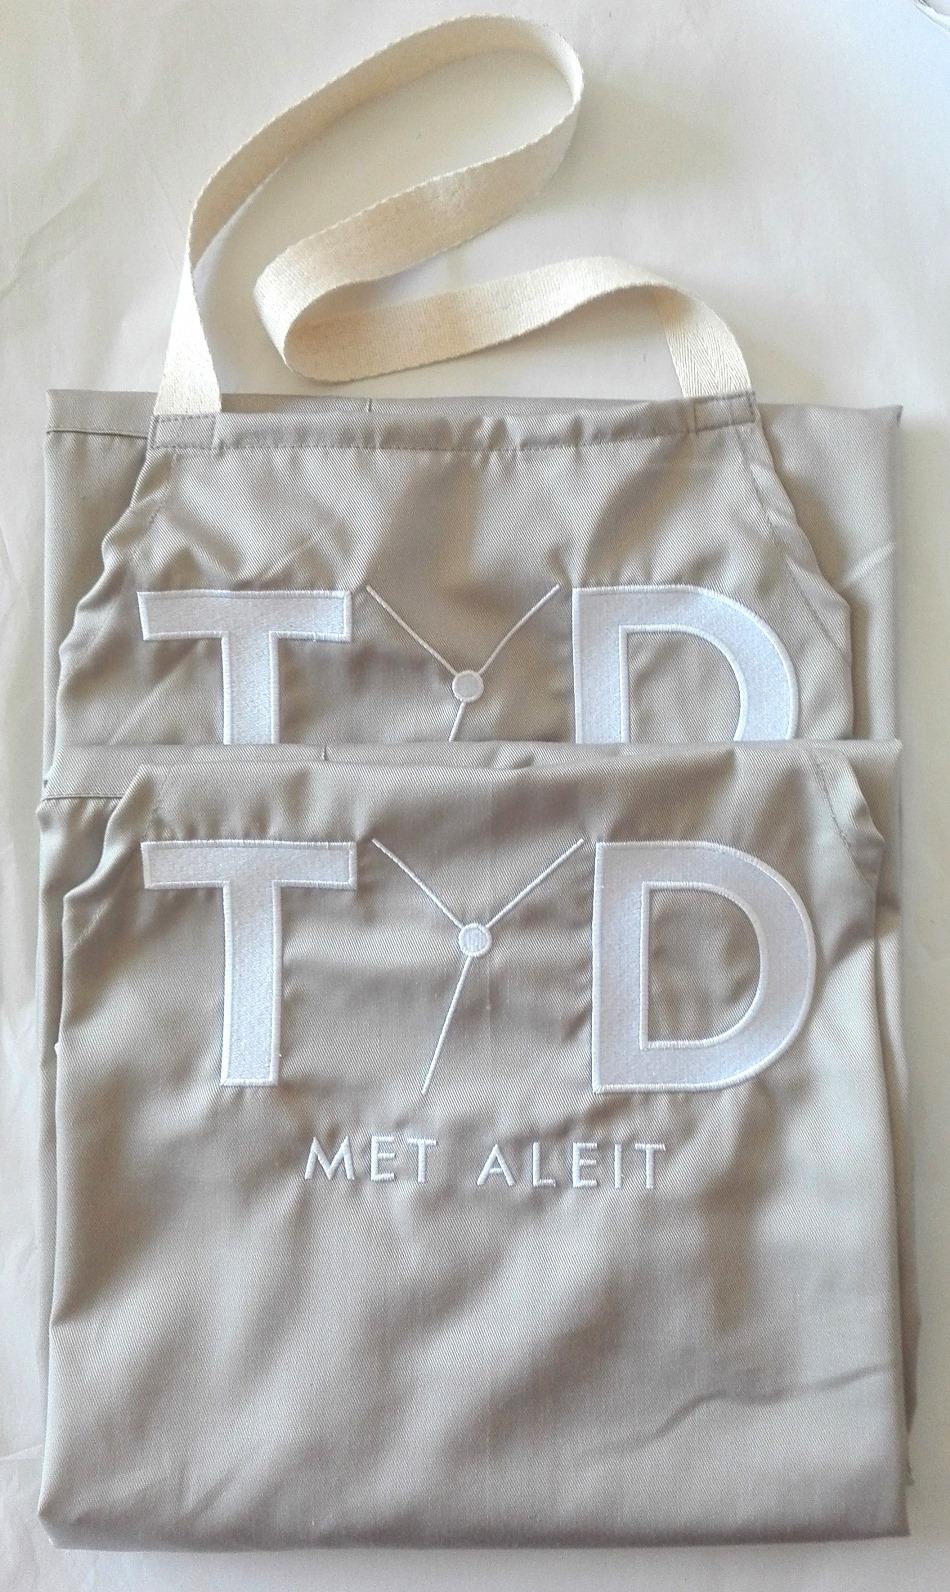 White apron cape town - La2452 Standard Bib Apron 76cm Adjustable Neck Strap Patch Pocket With Centre Divide Choice Of Patch Pocket A Or Towel Loop Pocket B